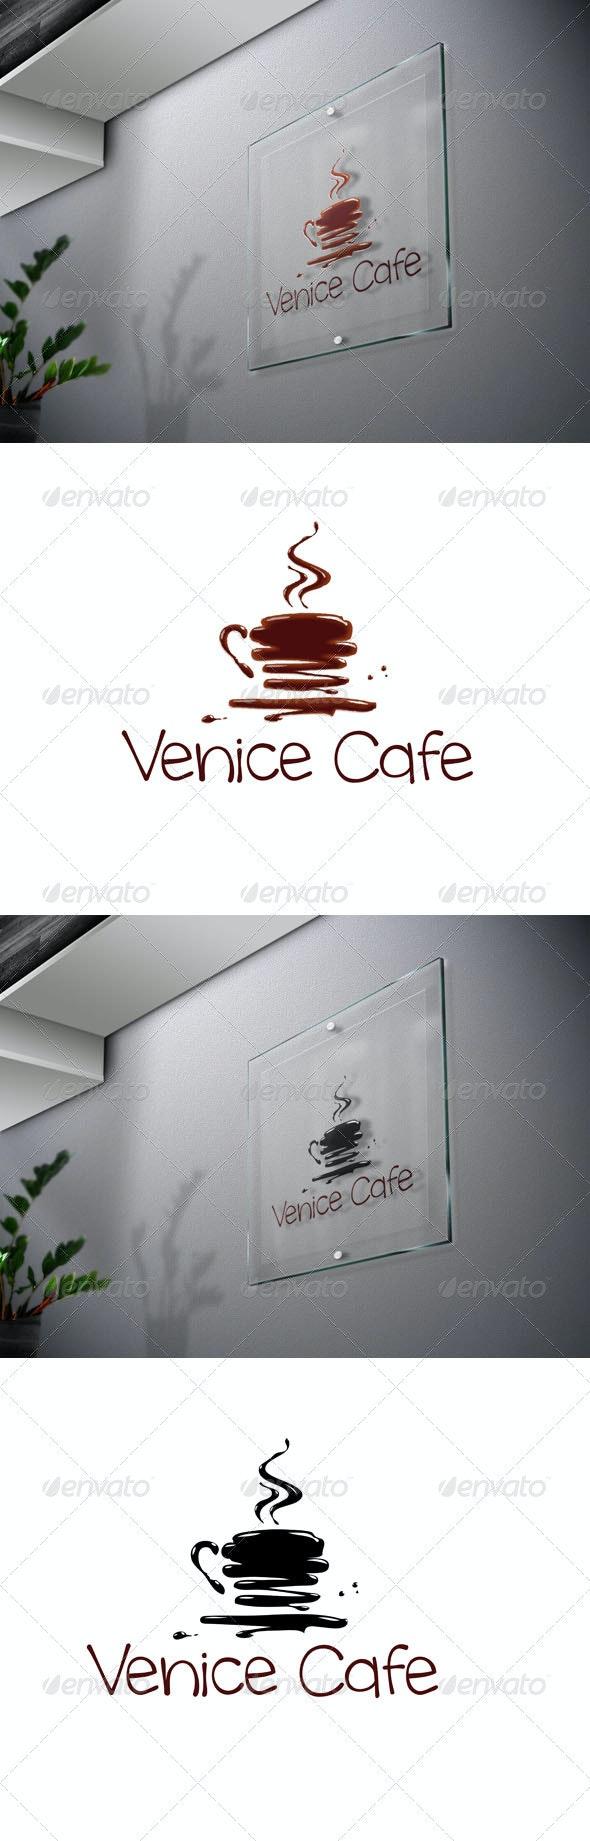 Venice Cafe 1 Logo Template - Food Logo Templates